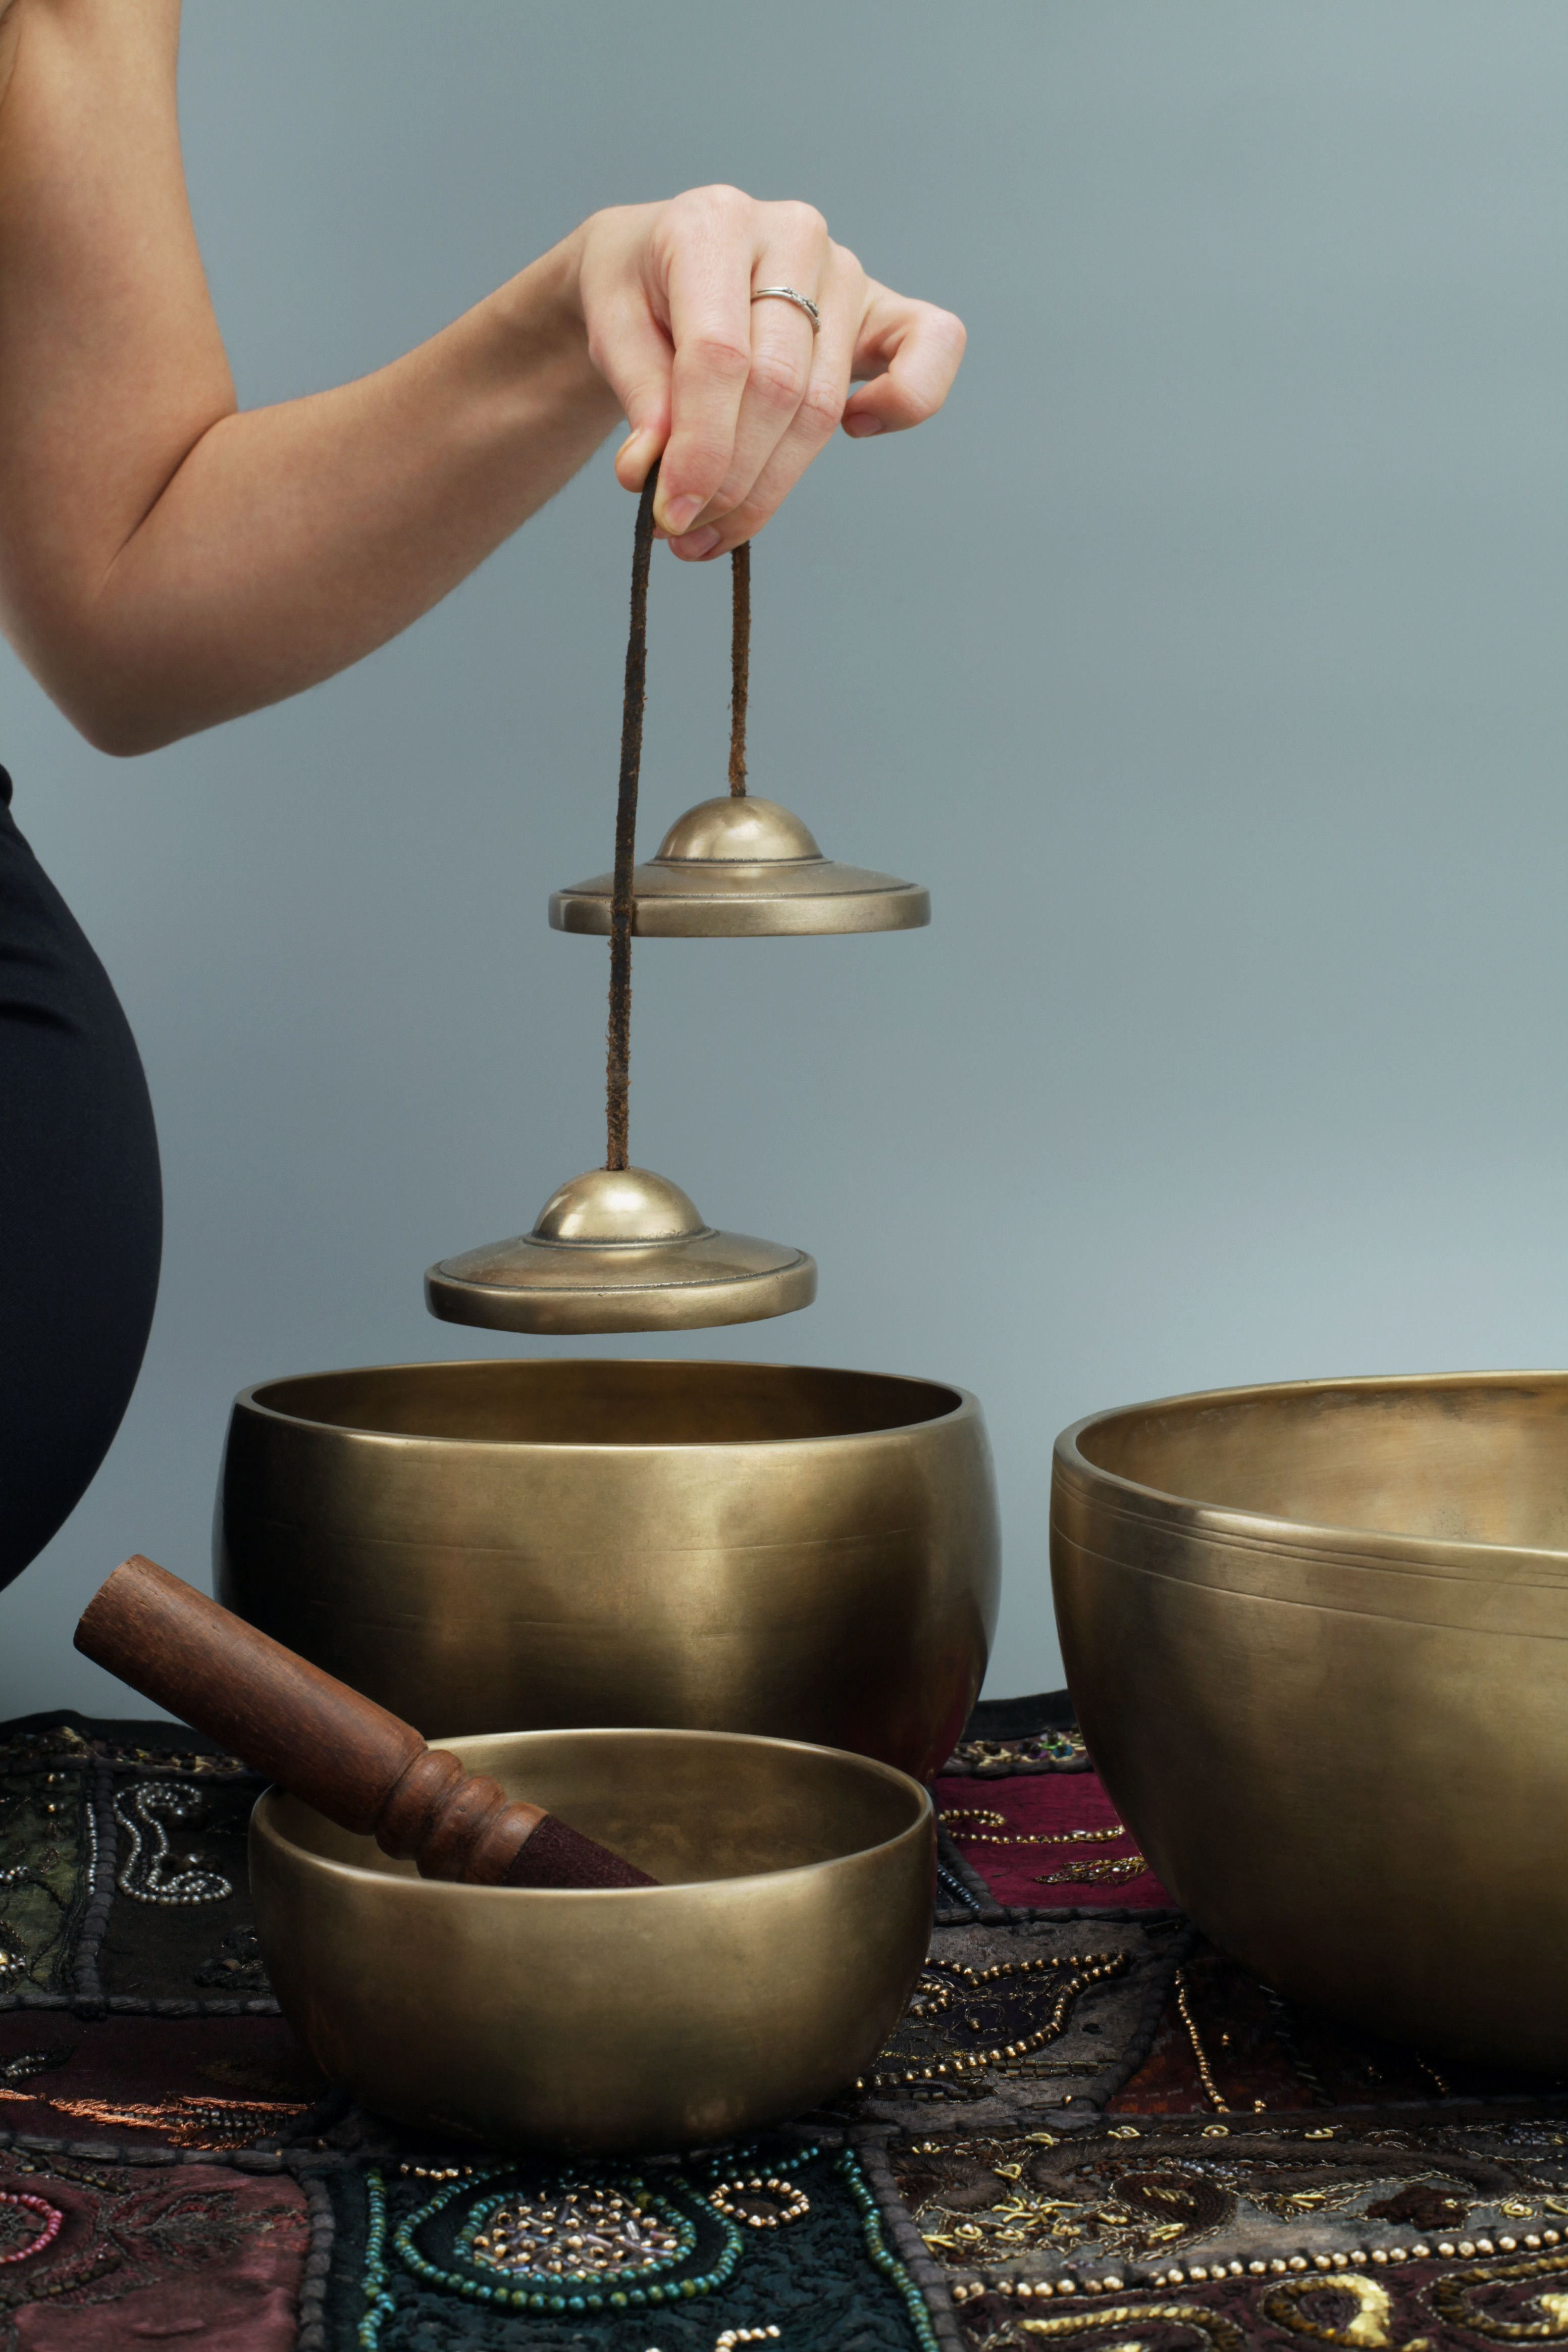 Large Tibetan Singing Bowl Set /— Pure Bronze Meditation Sound Bowl Handcrafted in Nepal /— 6.5 Inch